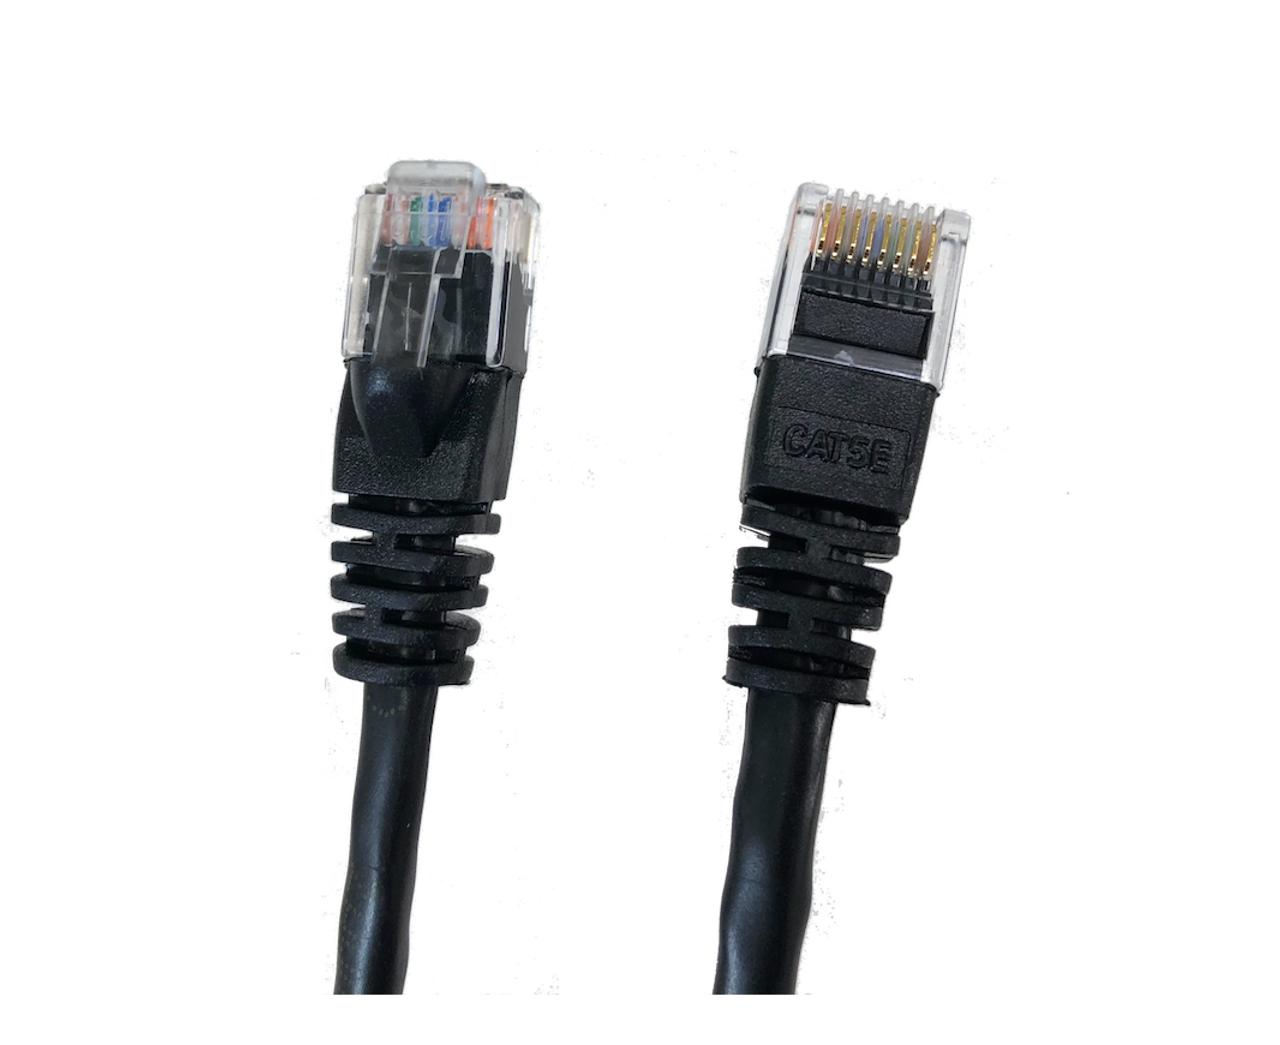 Category 5E UTP RJ45 Patch Cable Black - 5 ft